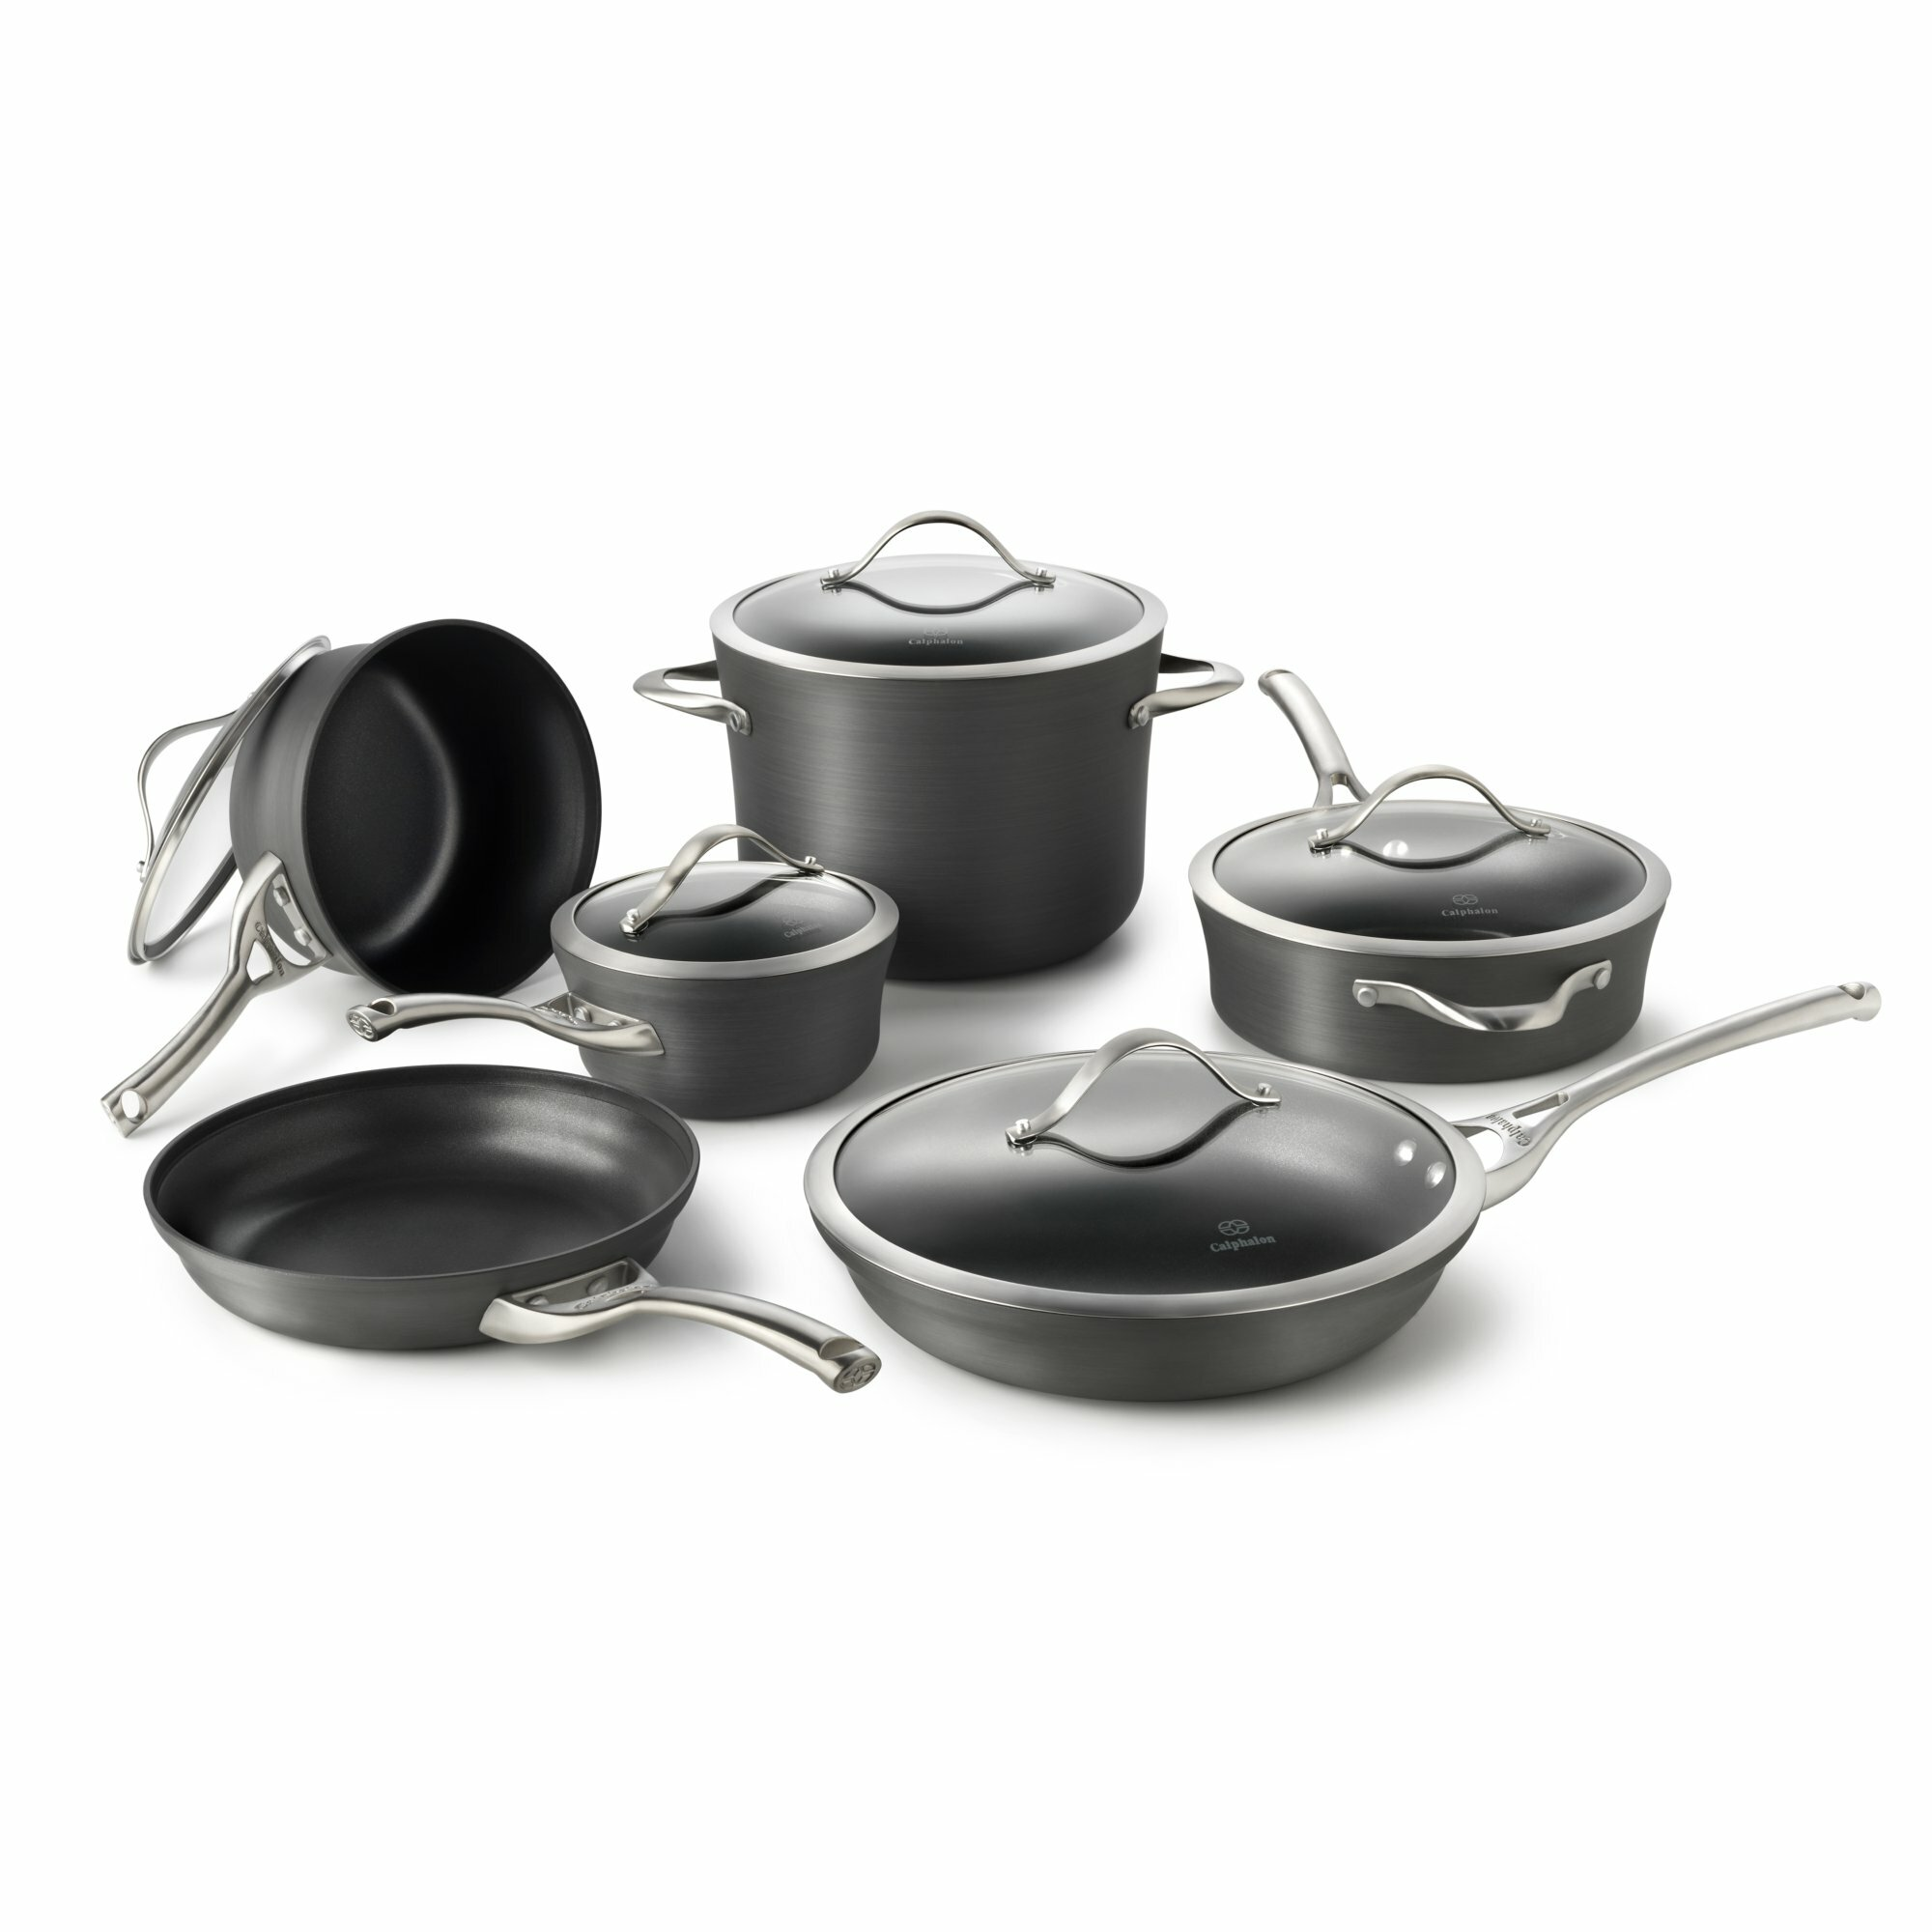 Calphalon Contemporary Nonstick 11 Piece Cookware Set & Reviews ...